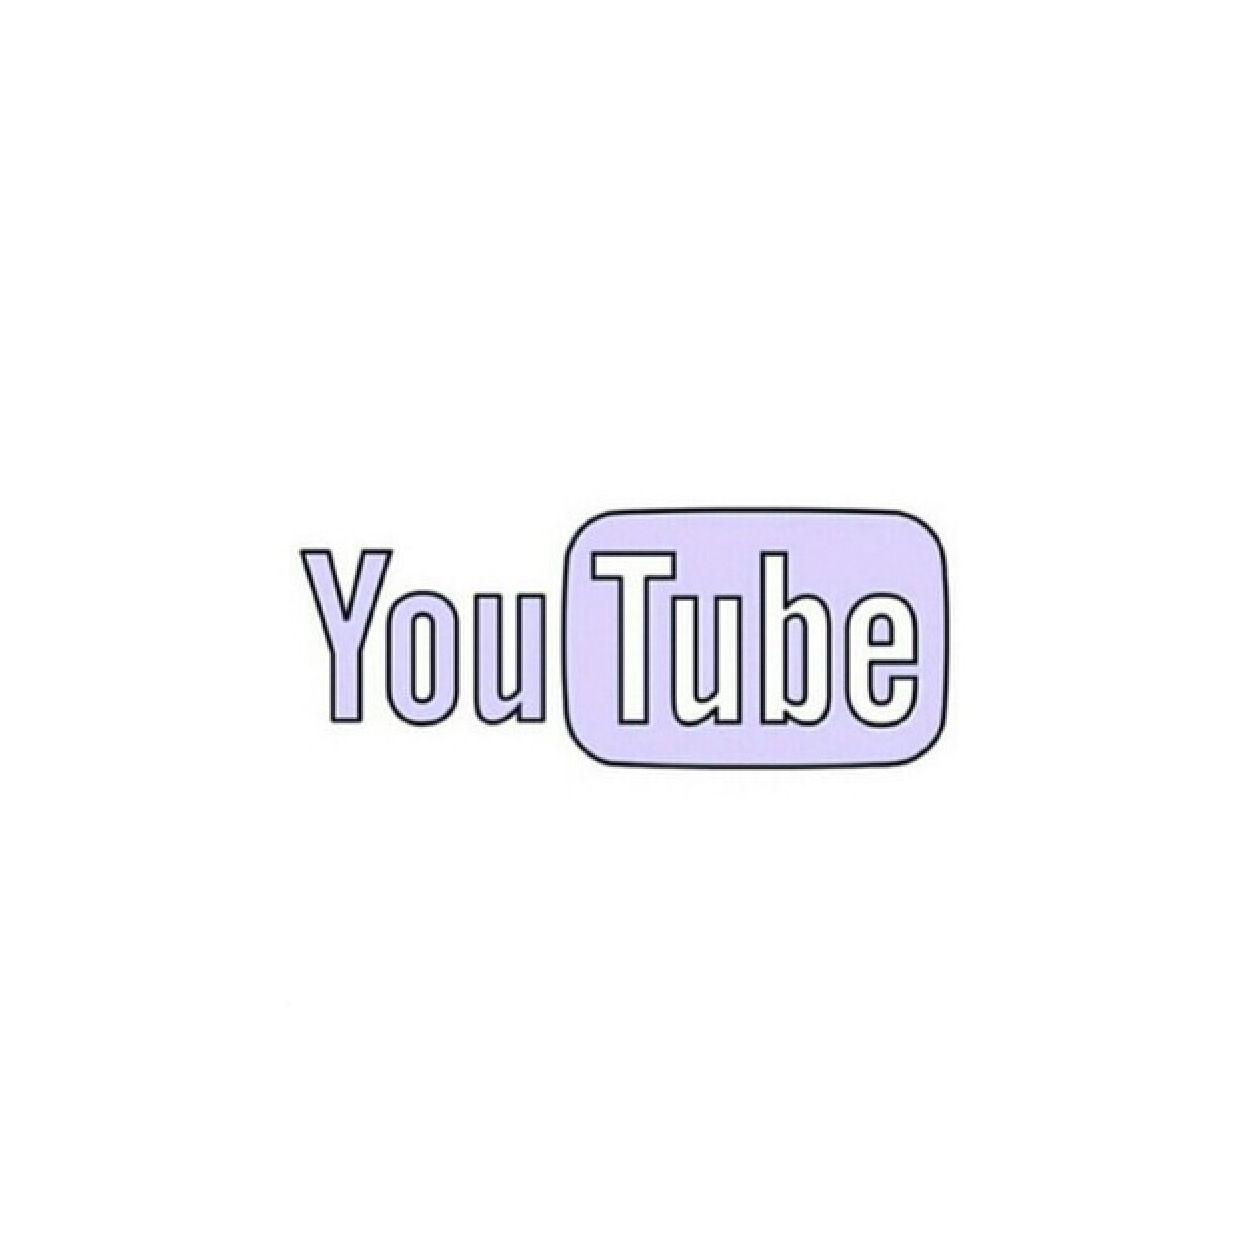 Purple Youtube Logo In 2020 Youtube Logo Iphone Wallpaper Tumblr Aesthetic Snapchat Logo